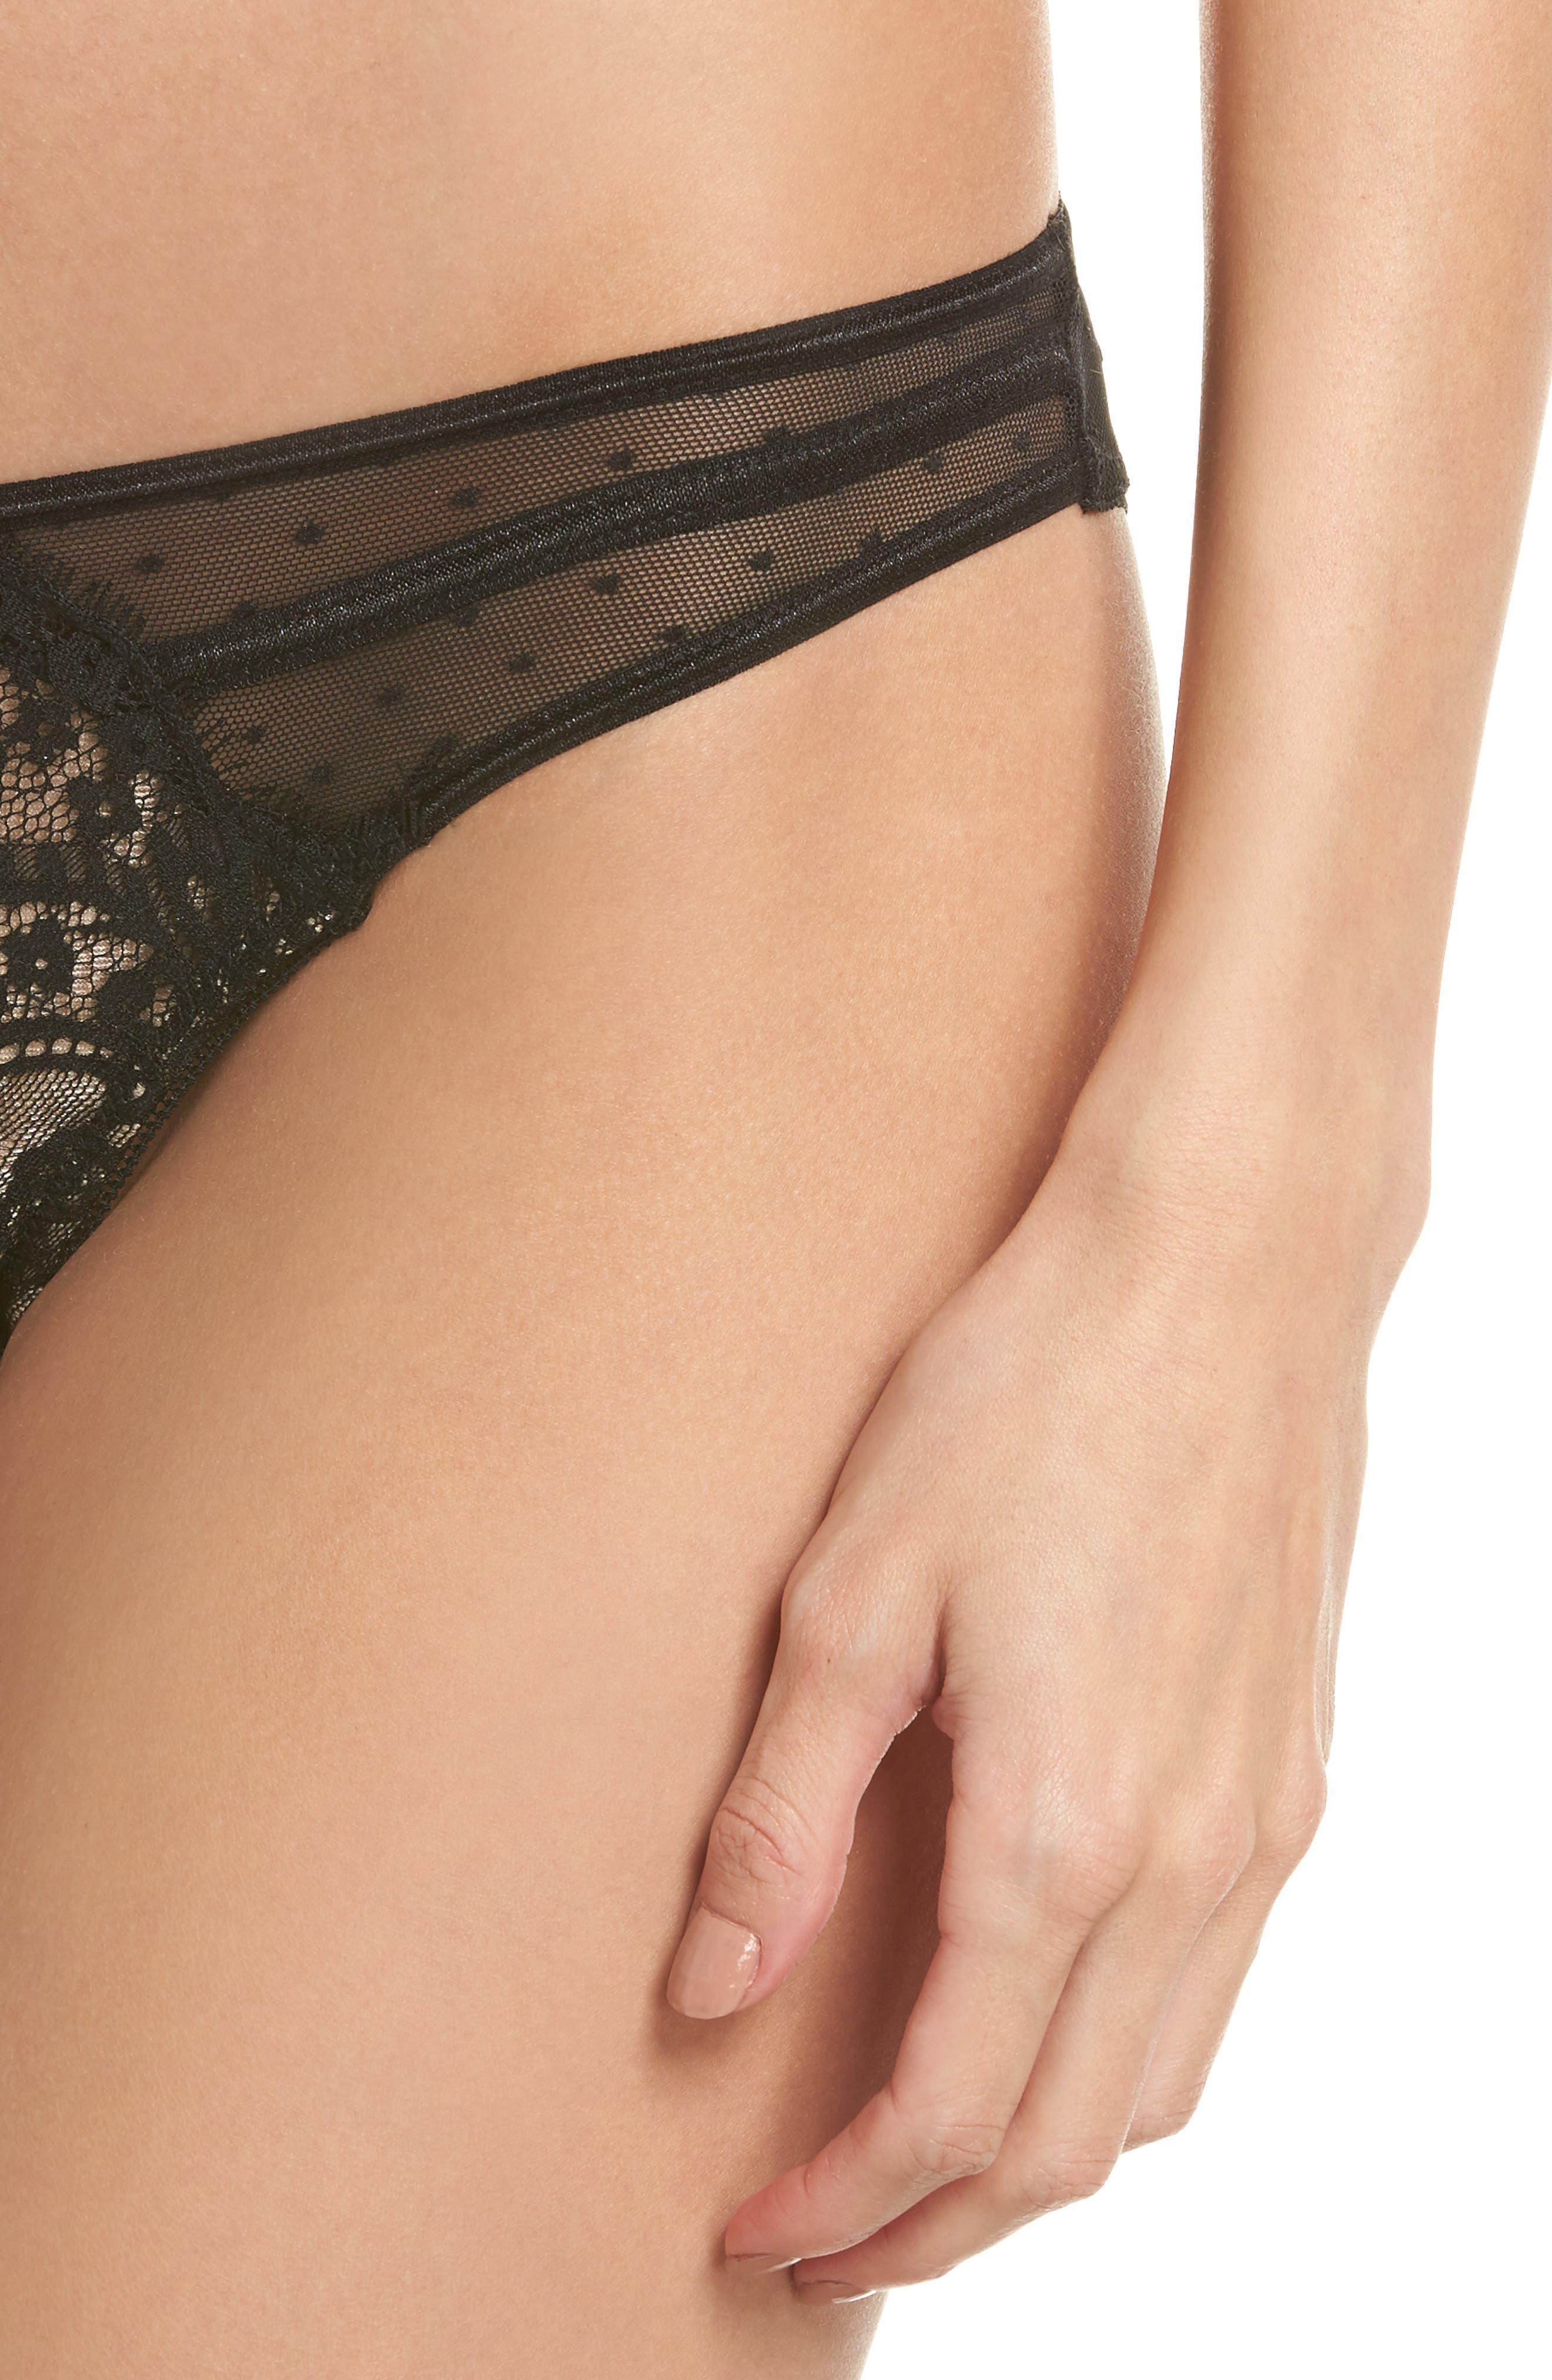 Between Sheets Panties,                             Alternate thumbnail 8, color,                             Black/ Nude